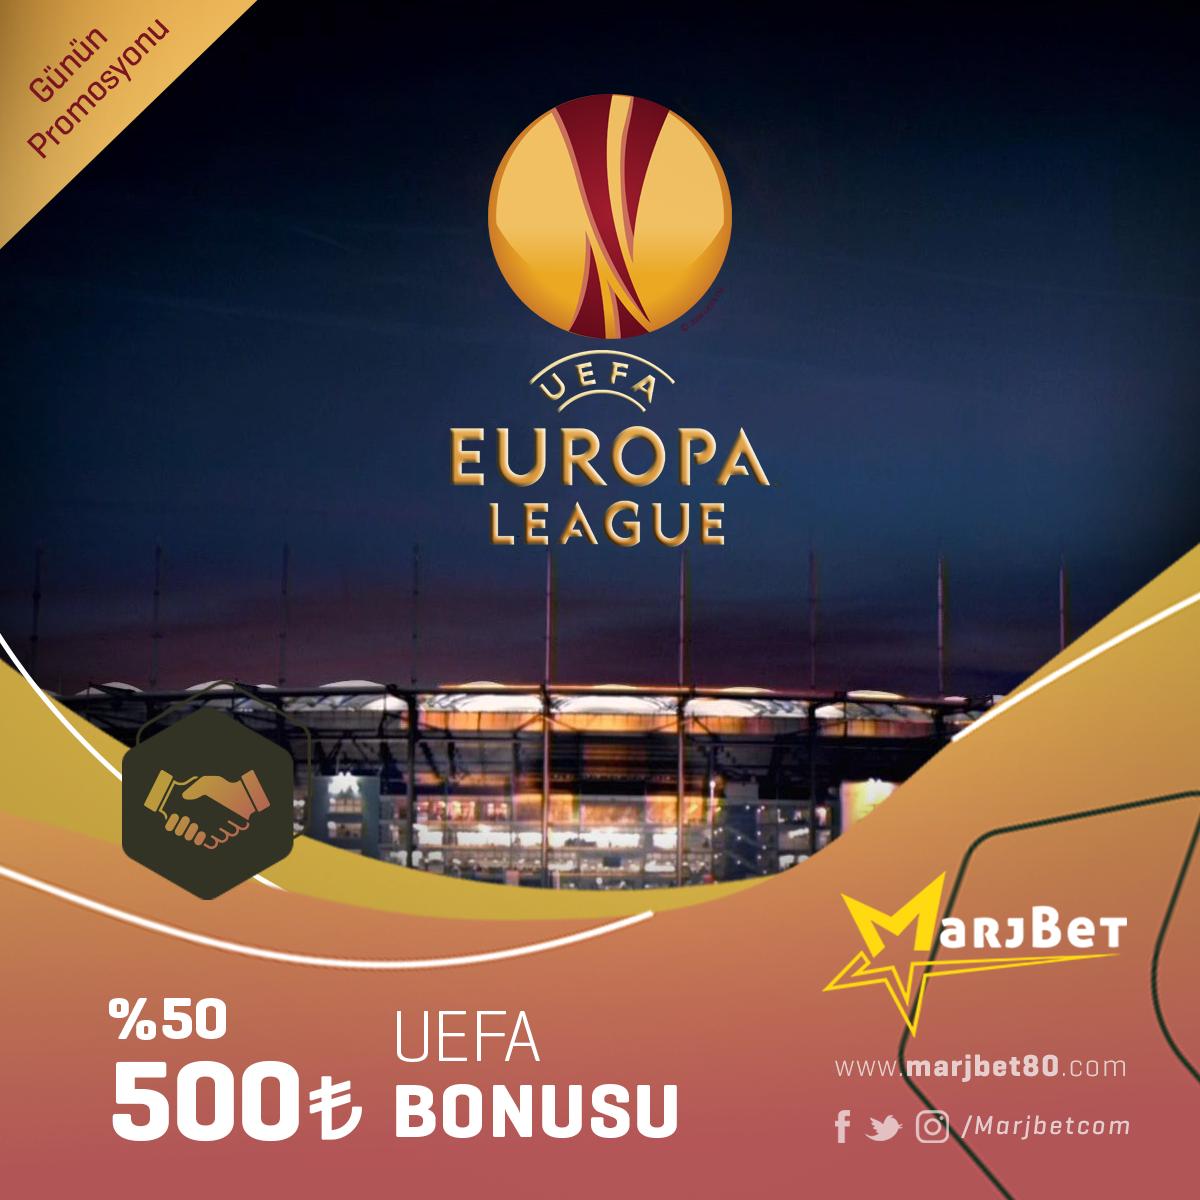 %50 UEFA Bonusu